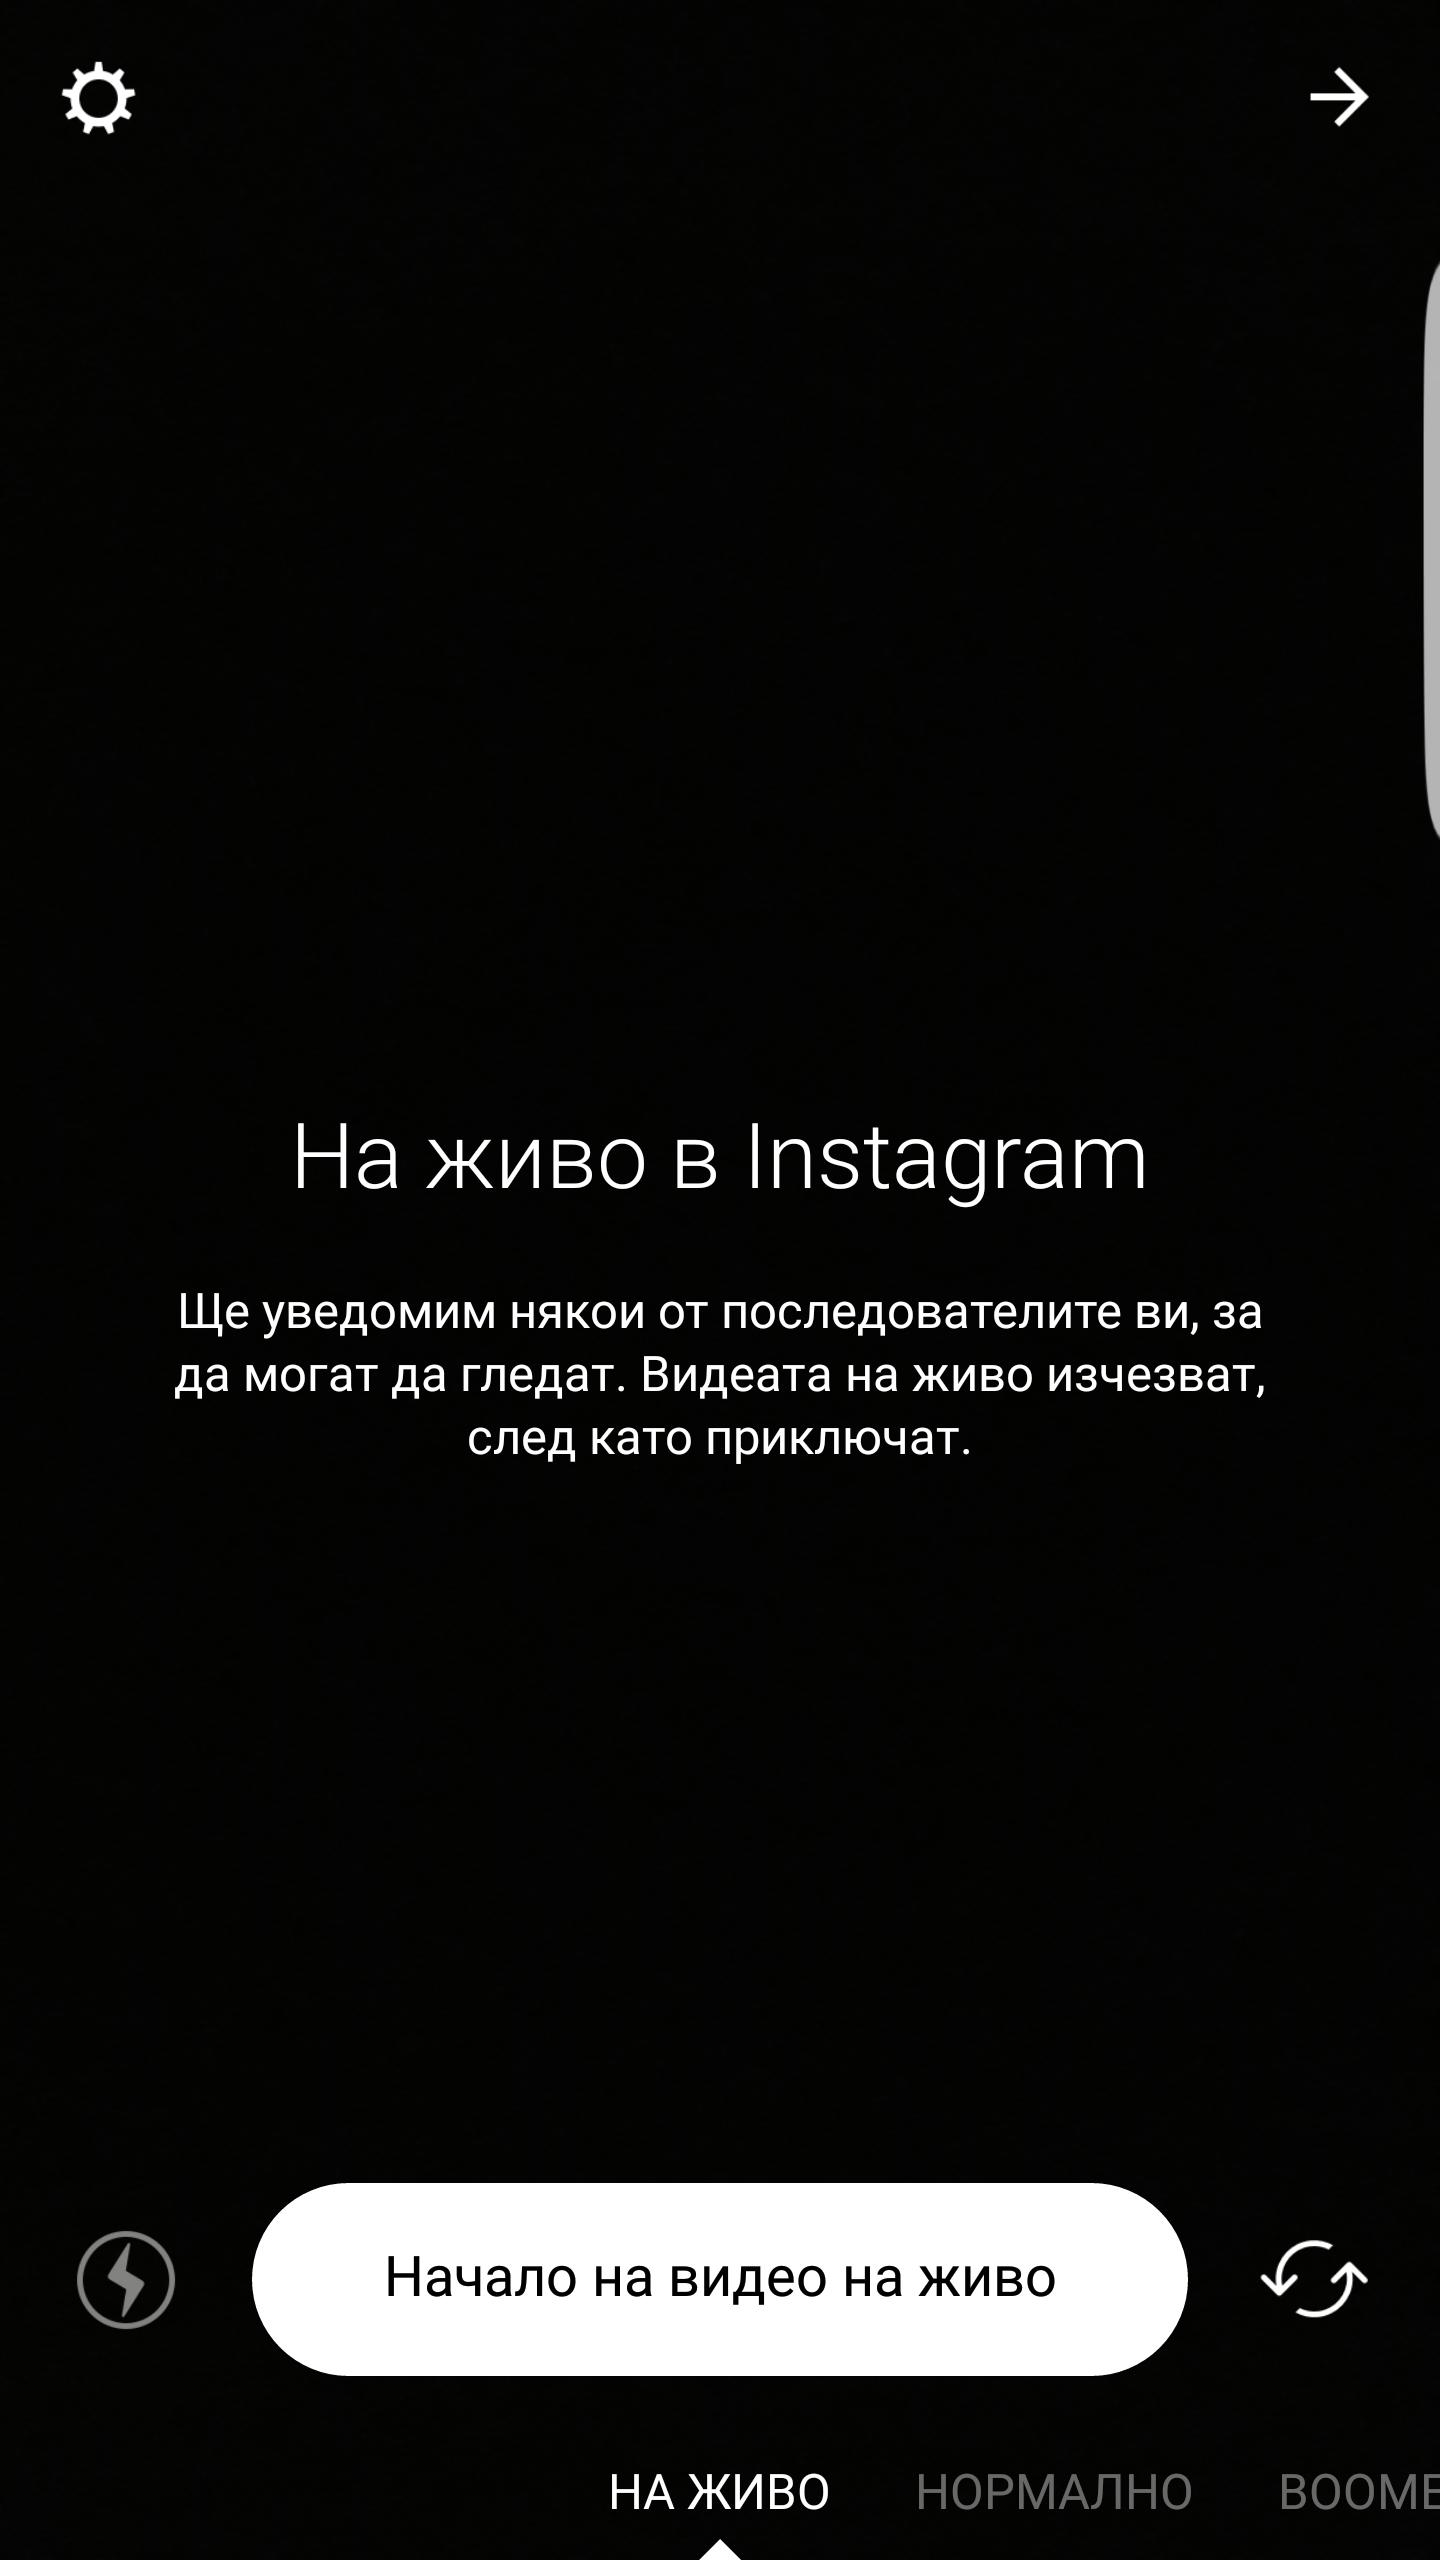 screenshot_20170208-124748